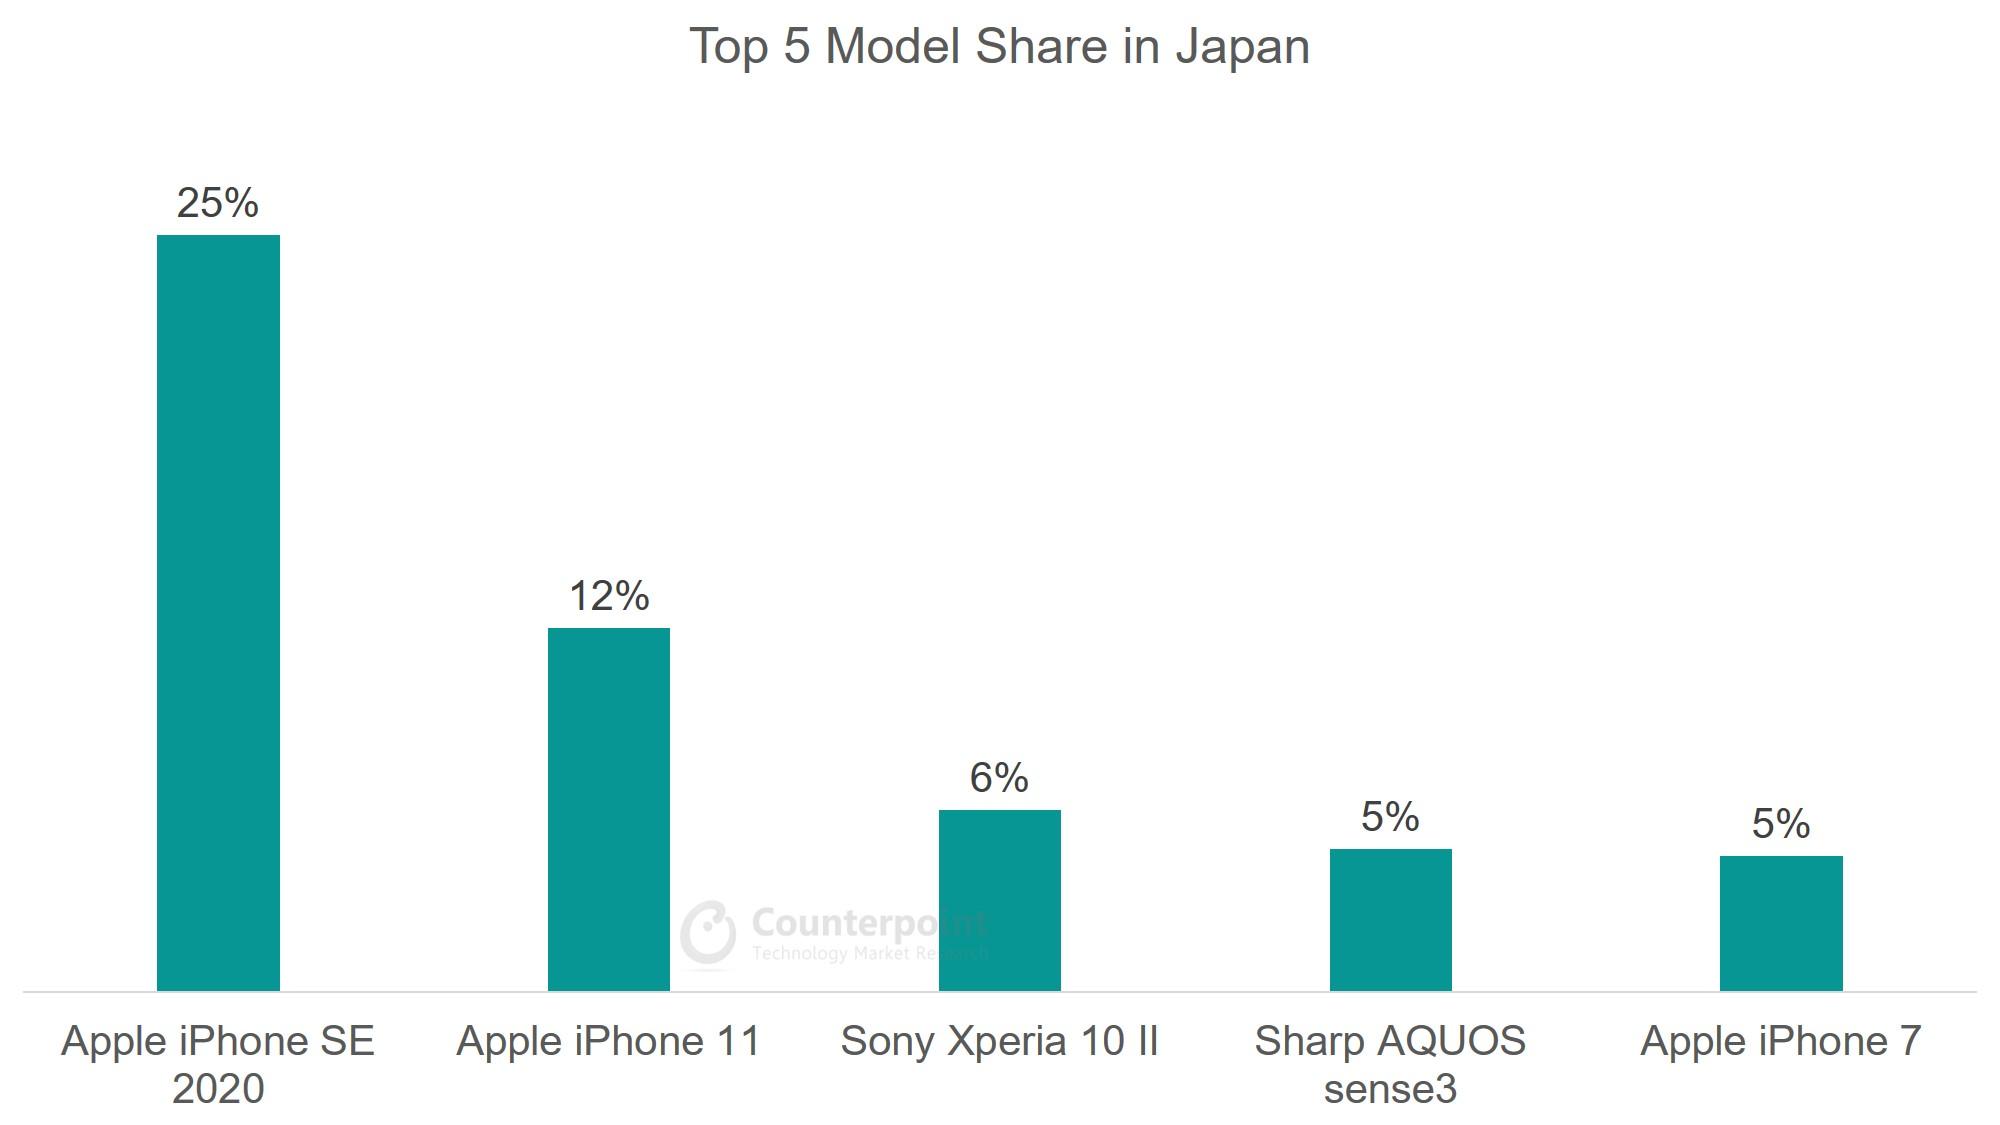 Japan - Top 5 Model Share - Jul 2020